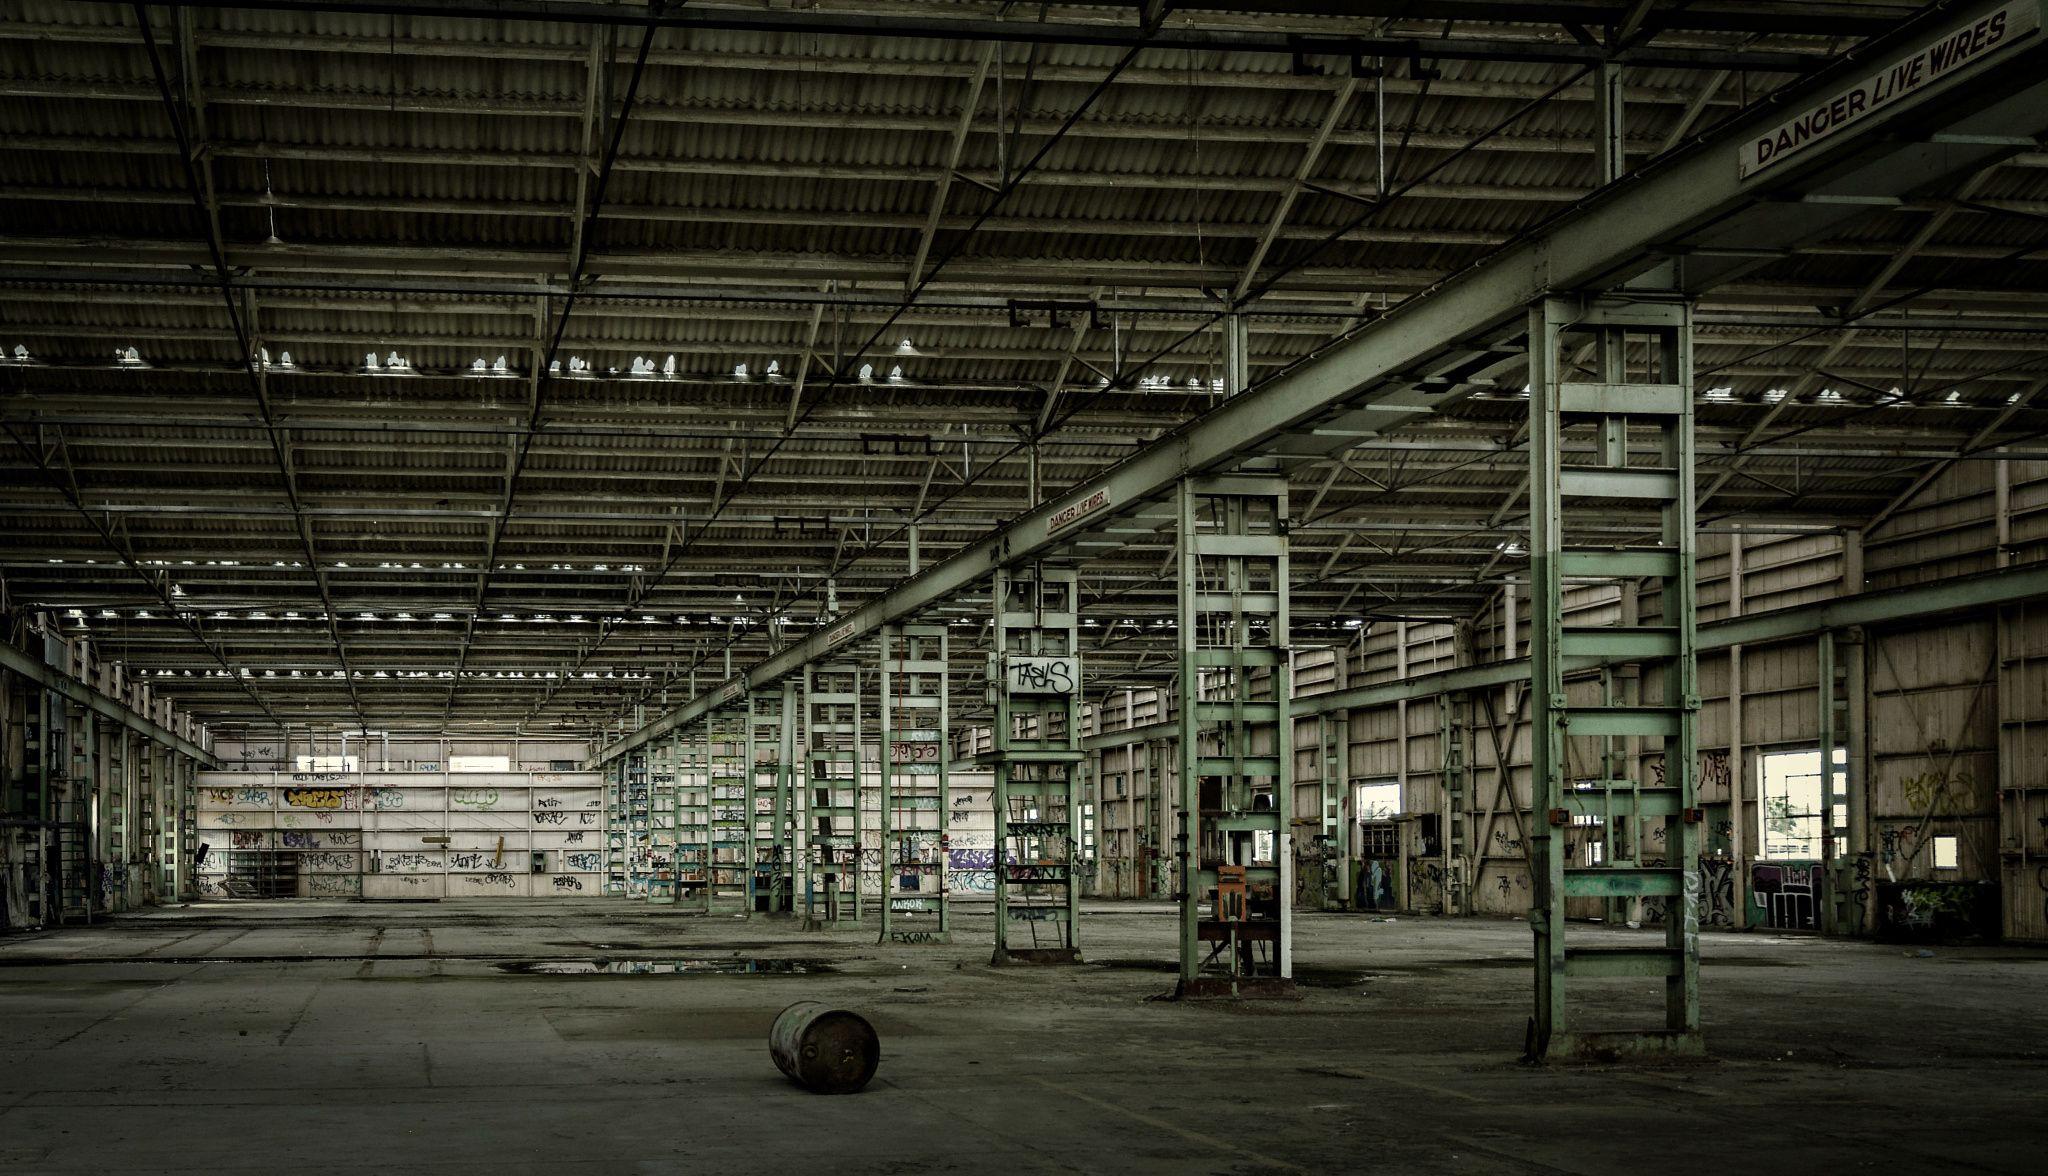 A Big Shed Big Sheds Shed Abandoned Warehouse